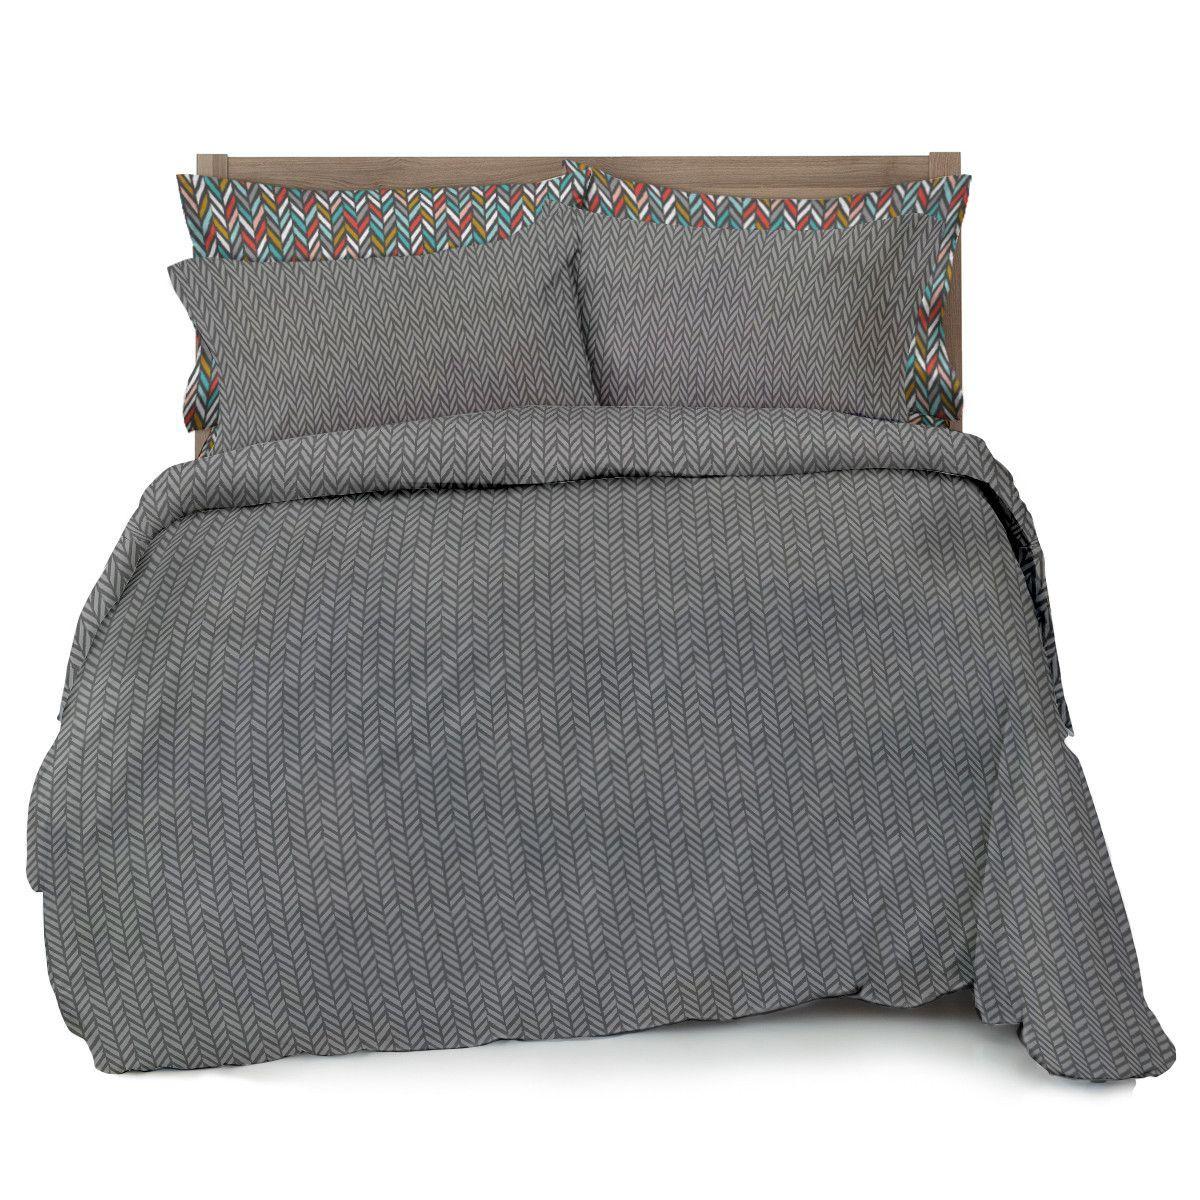 Double Brushed Ultra Microfiber Grey Herringbone Comforter